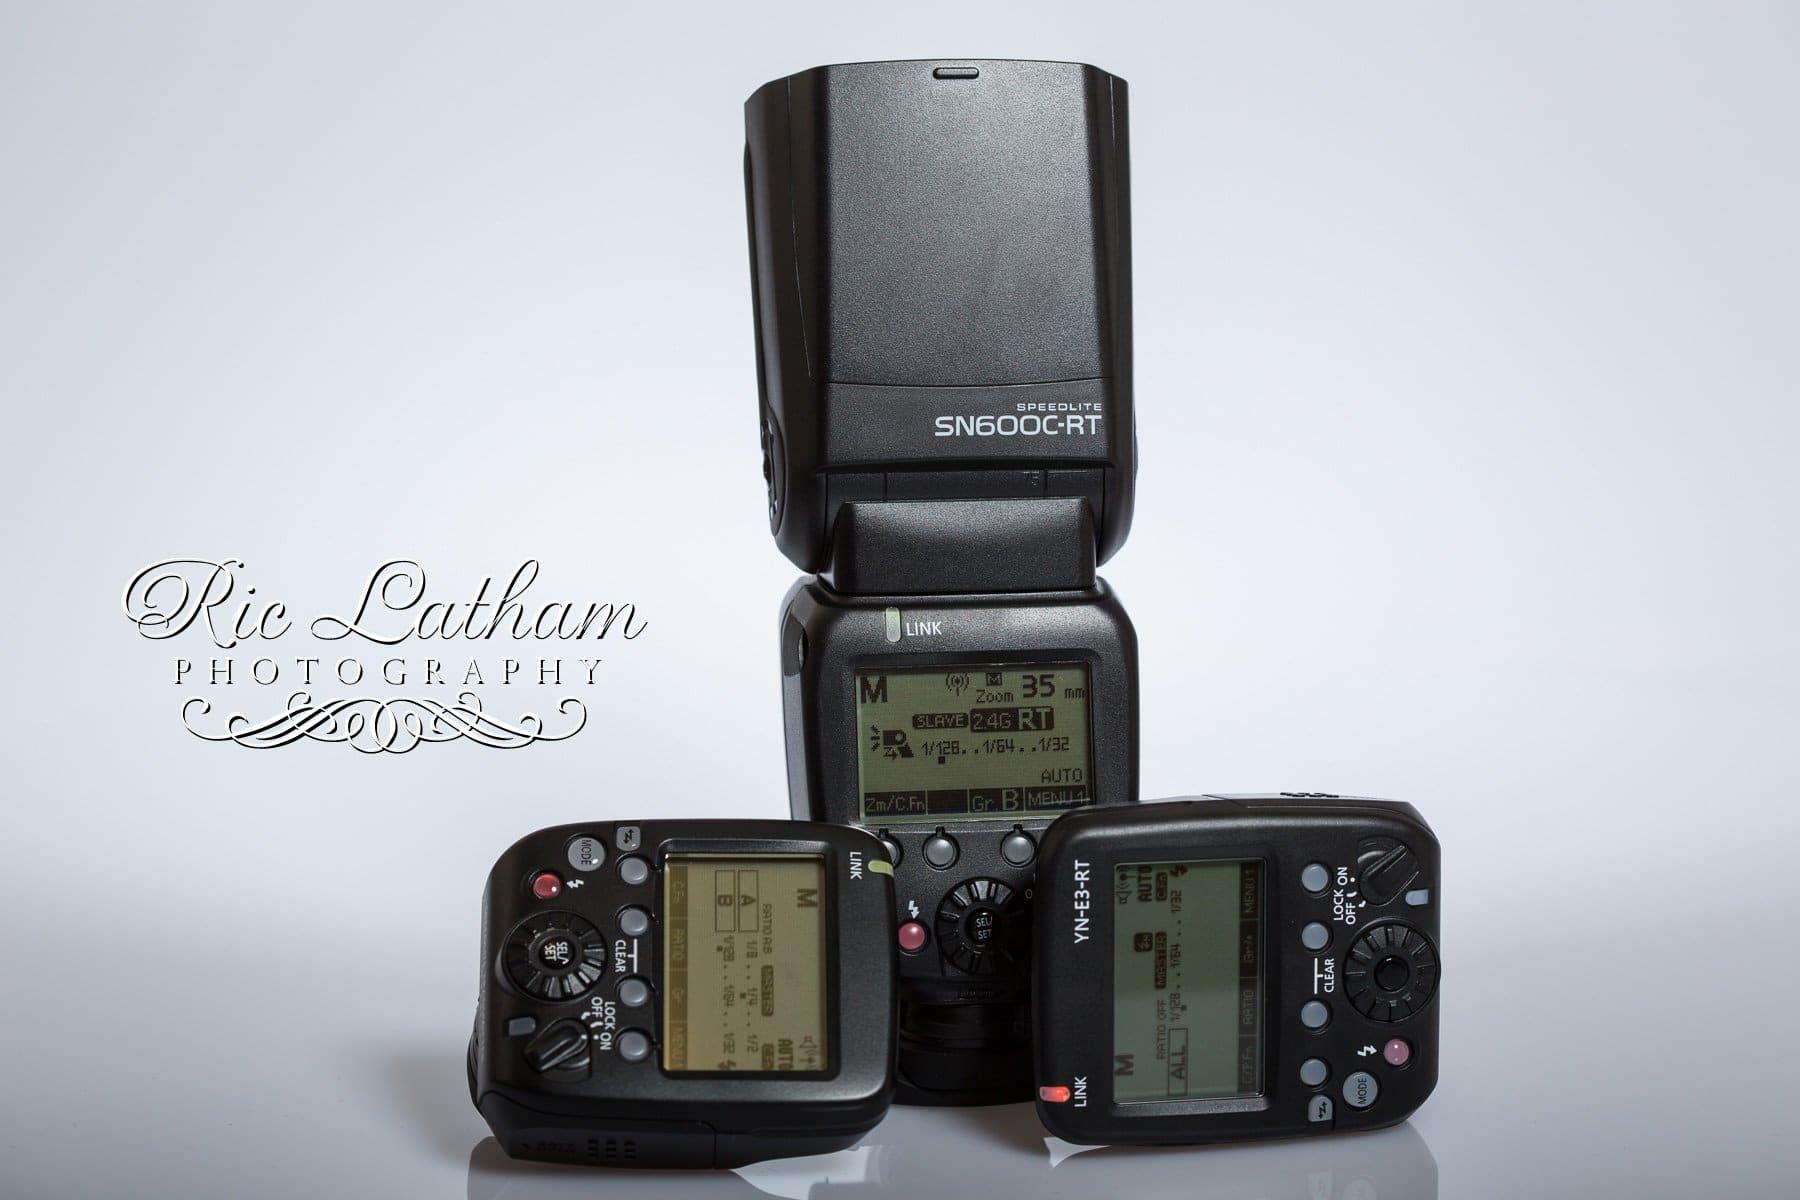 shanny-SN600C-RT-0021